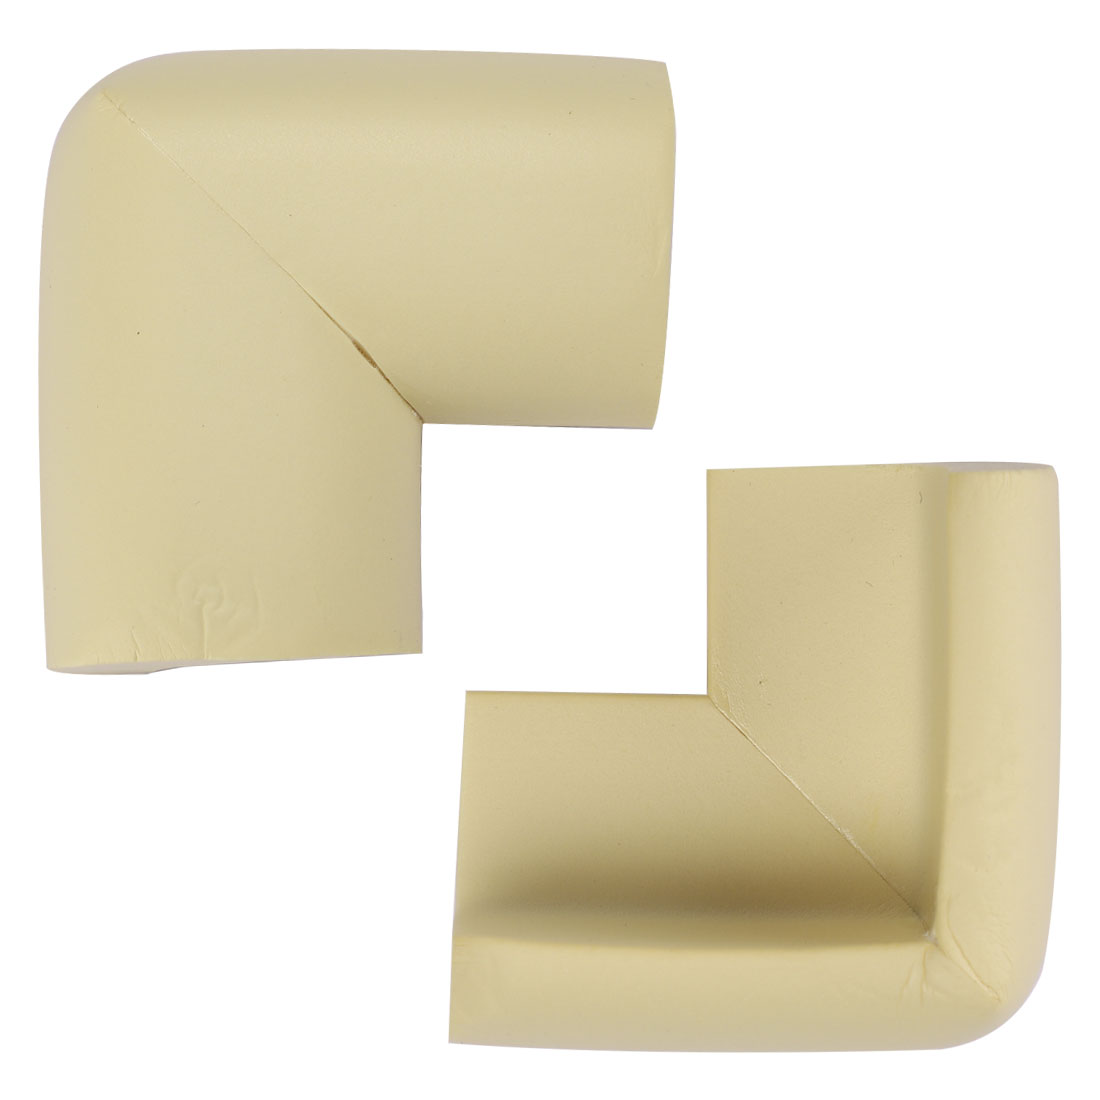 Desk Edge Foam Corner Cushion Guard Strip Soft Bumper Protector 2pcs Beiges